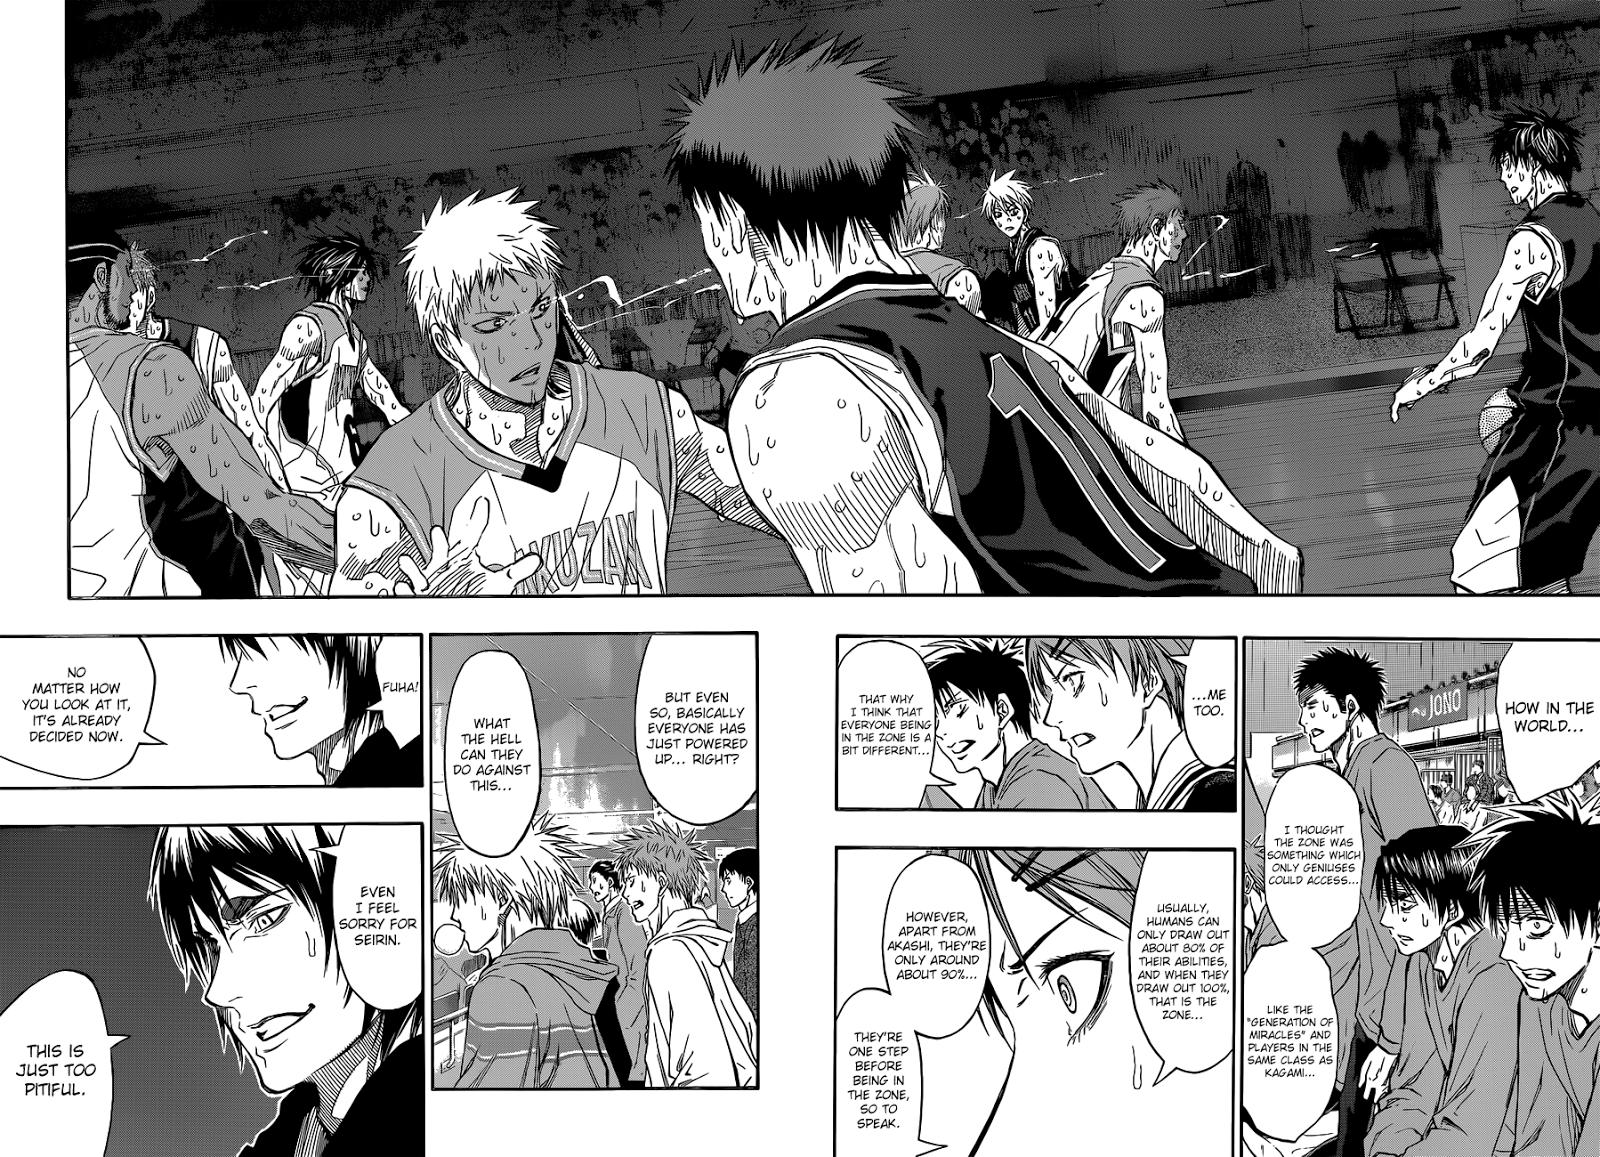 Kuroko no Basket Manga Chapter 268 - Image 08-09